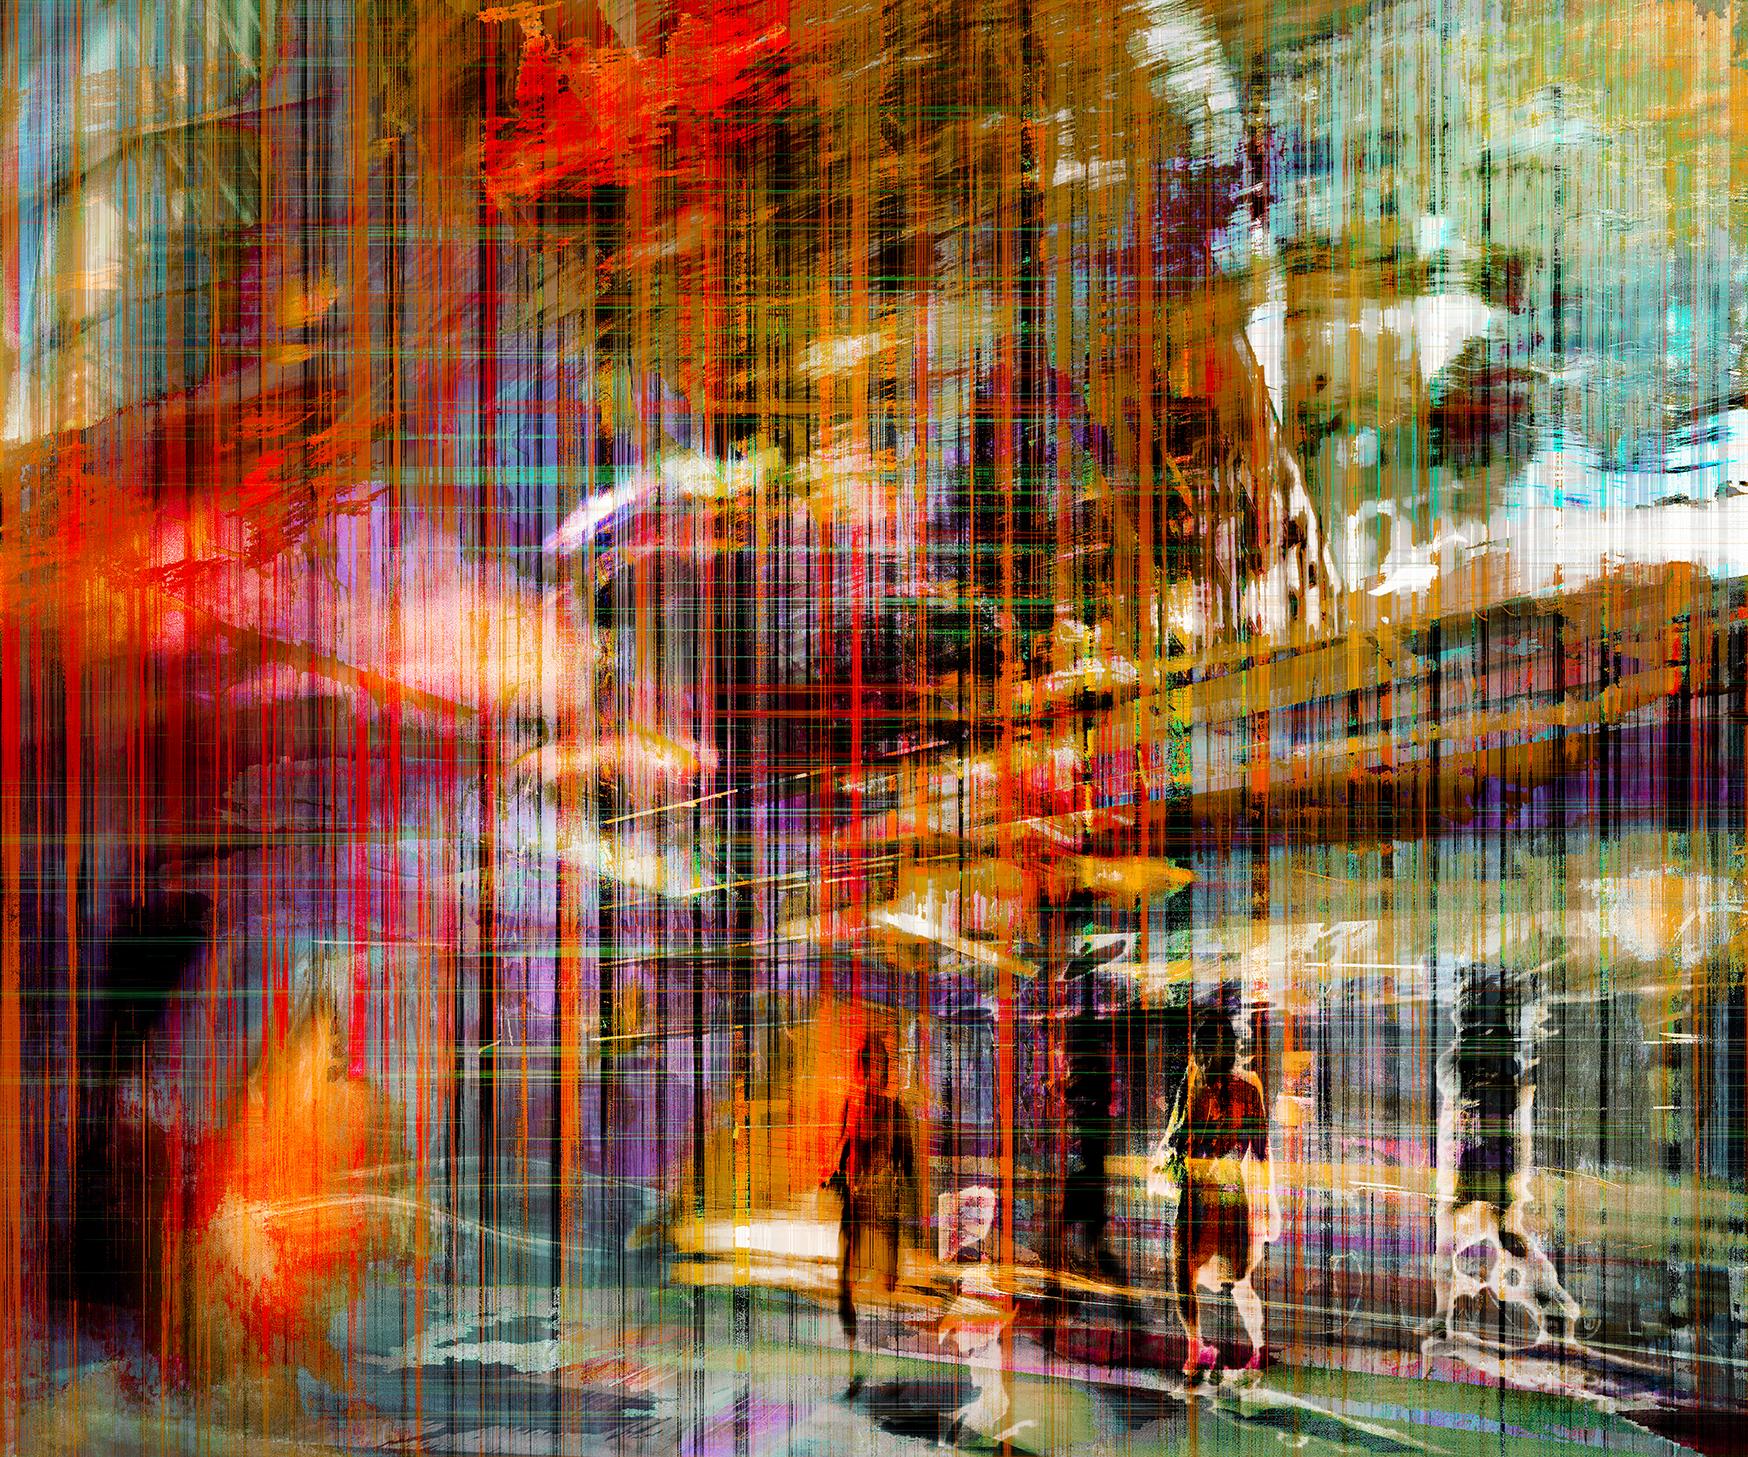 0004-2-Urban-girl-shades-50x60-web-Jens-Christian-Wittig-